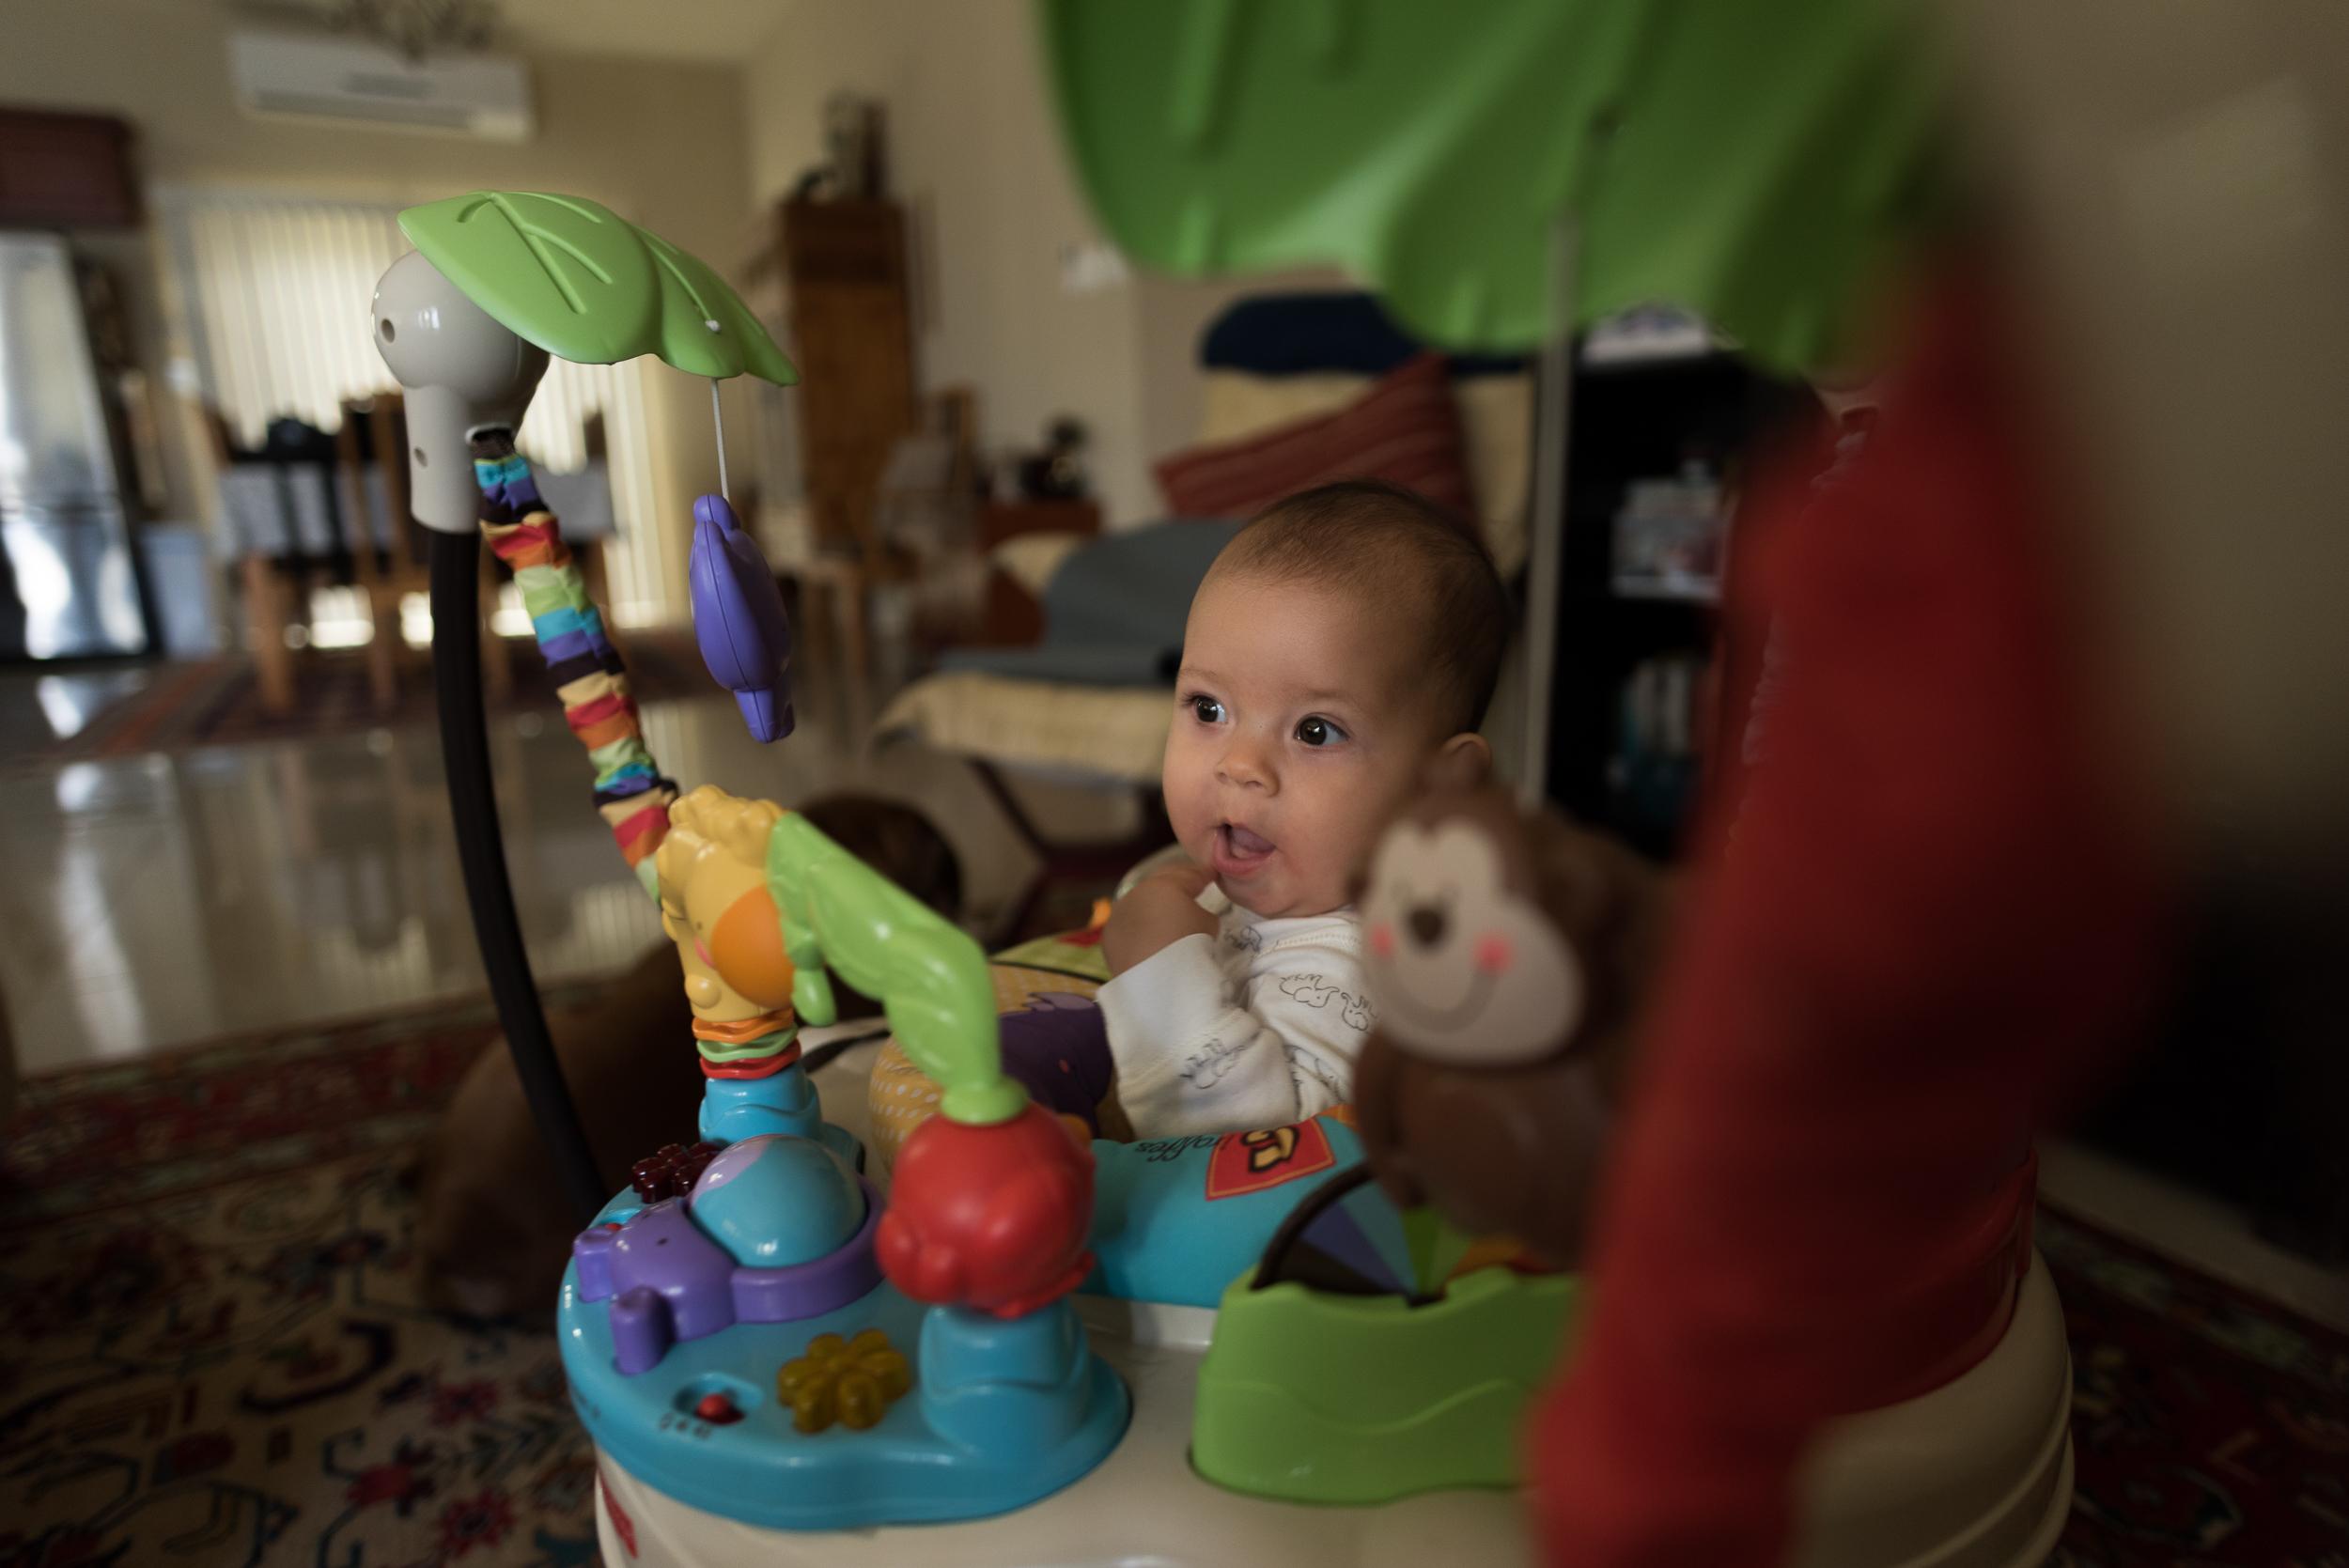 baby-year-one-motherhood-roxanne-augusta-guam-photography-12.jpg